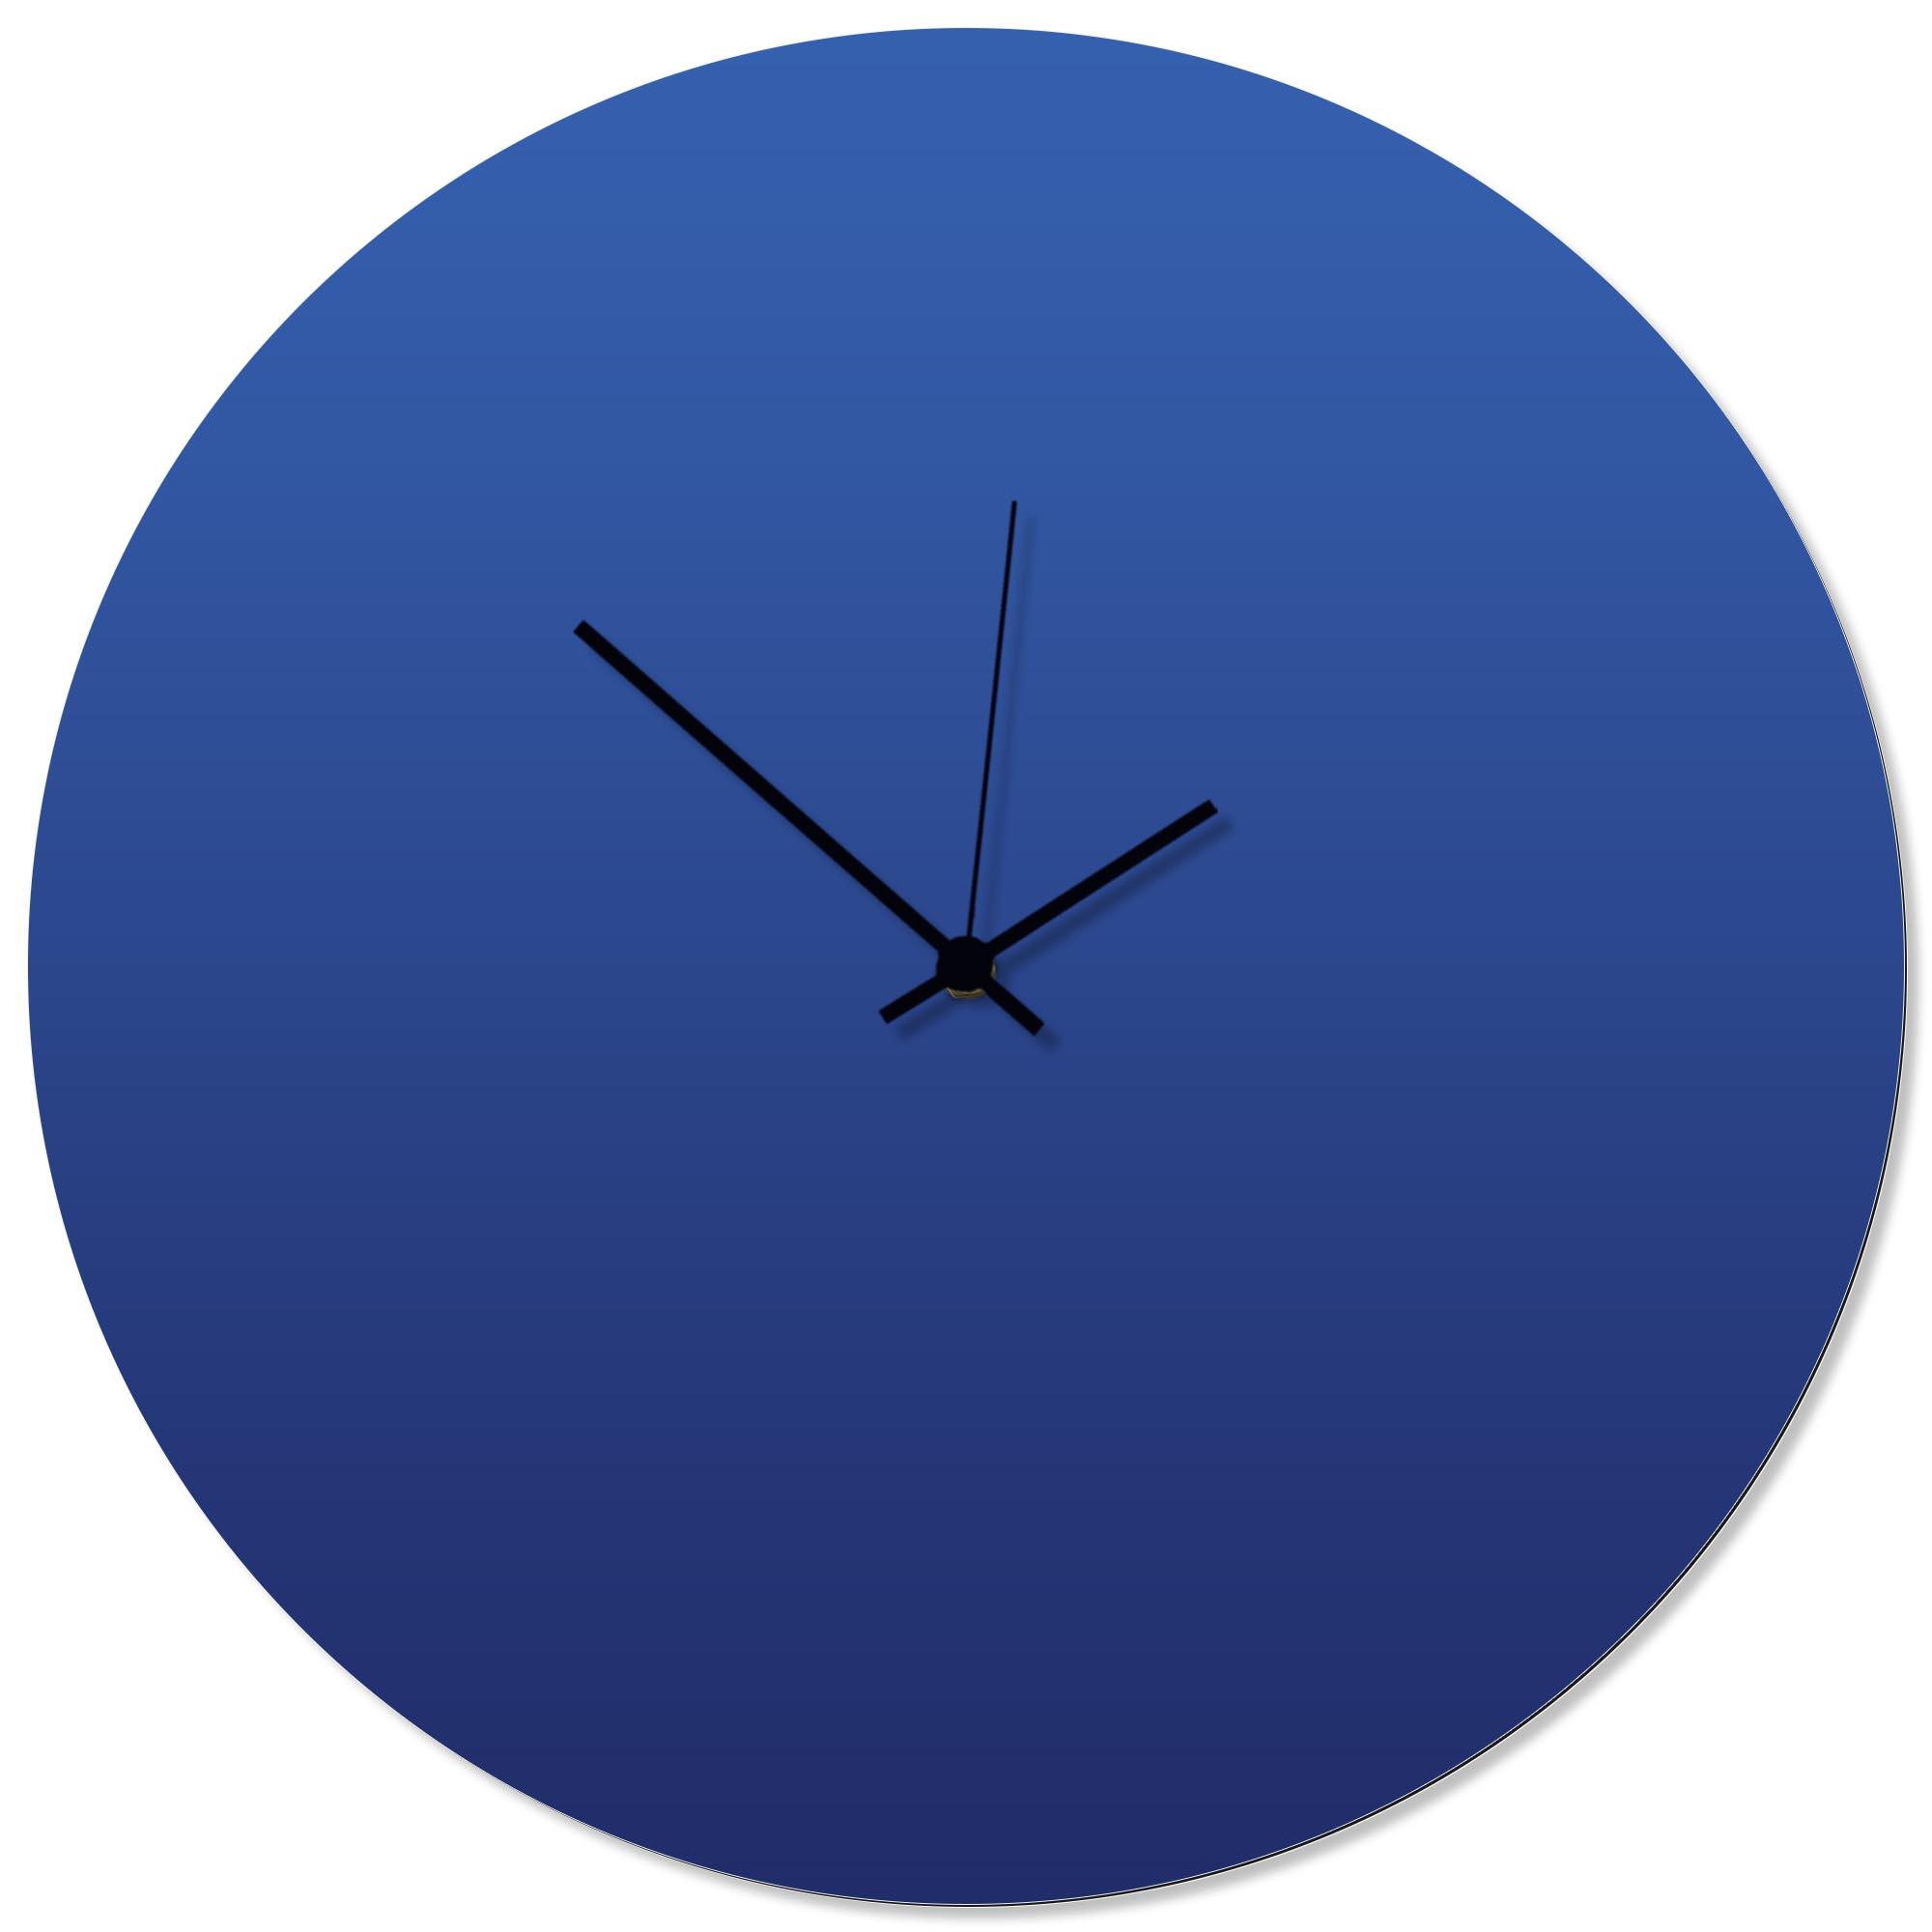 Blueout Black Circle Clock Large 23x23in. Aluminum Polymetal